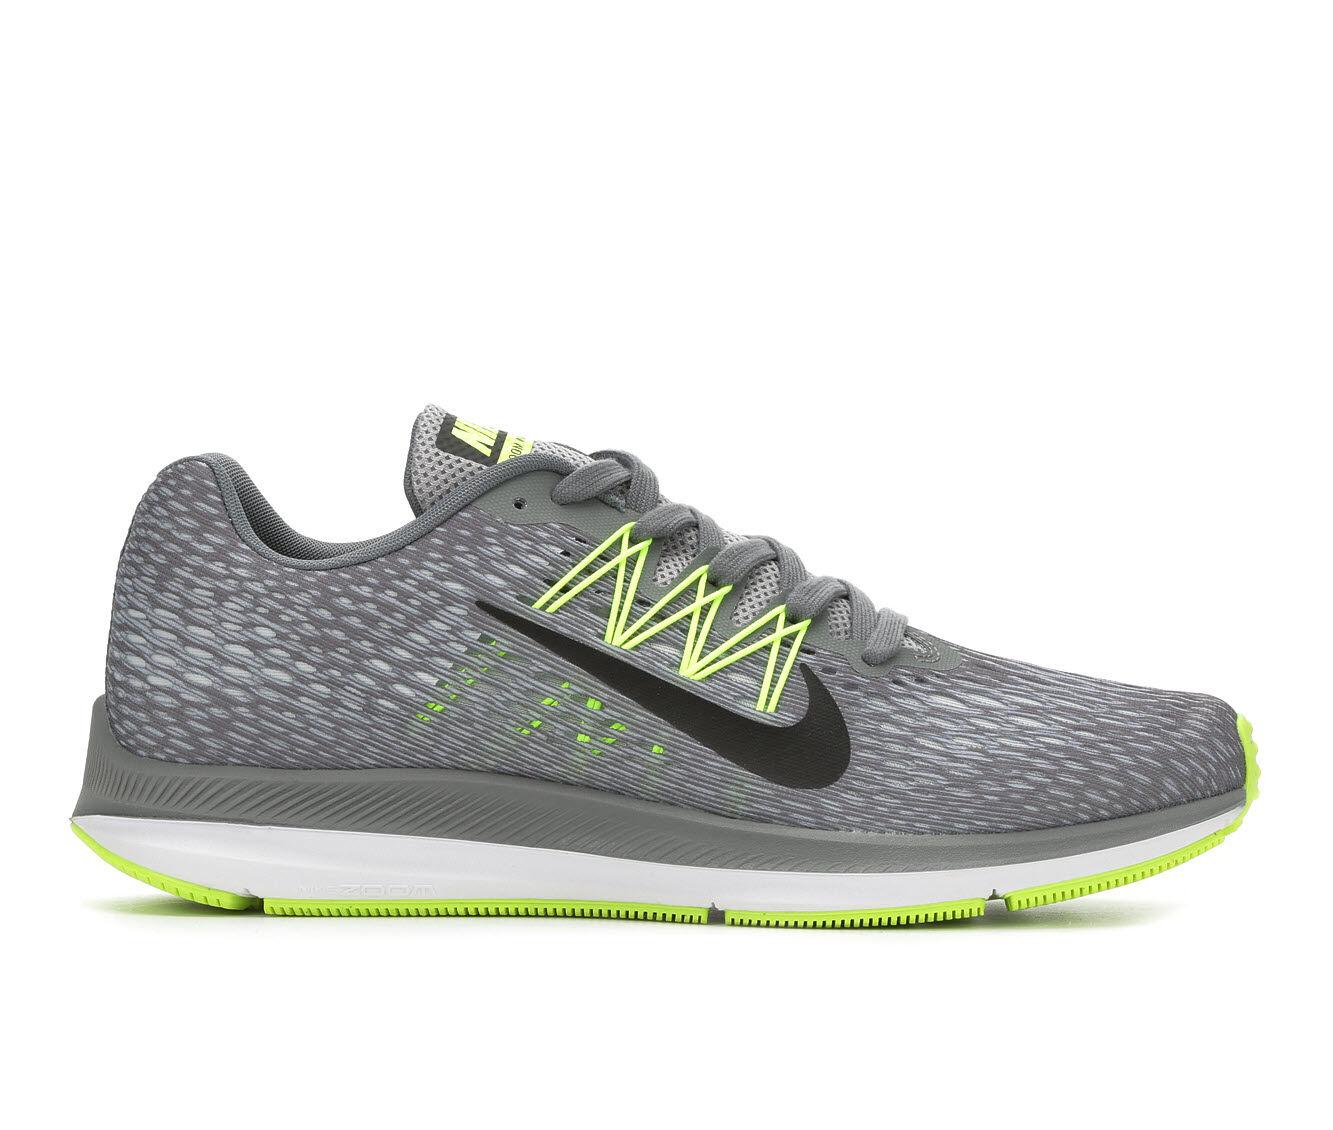 Men's Nike Zoom Winflo 5 Running Shoes Gry/Blk/Vlt